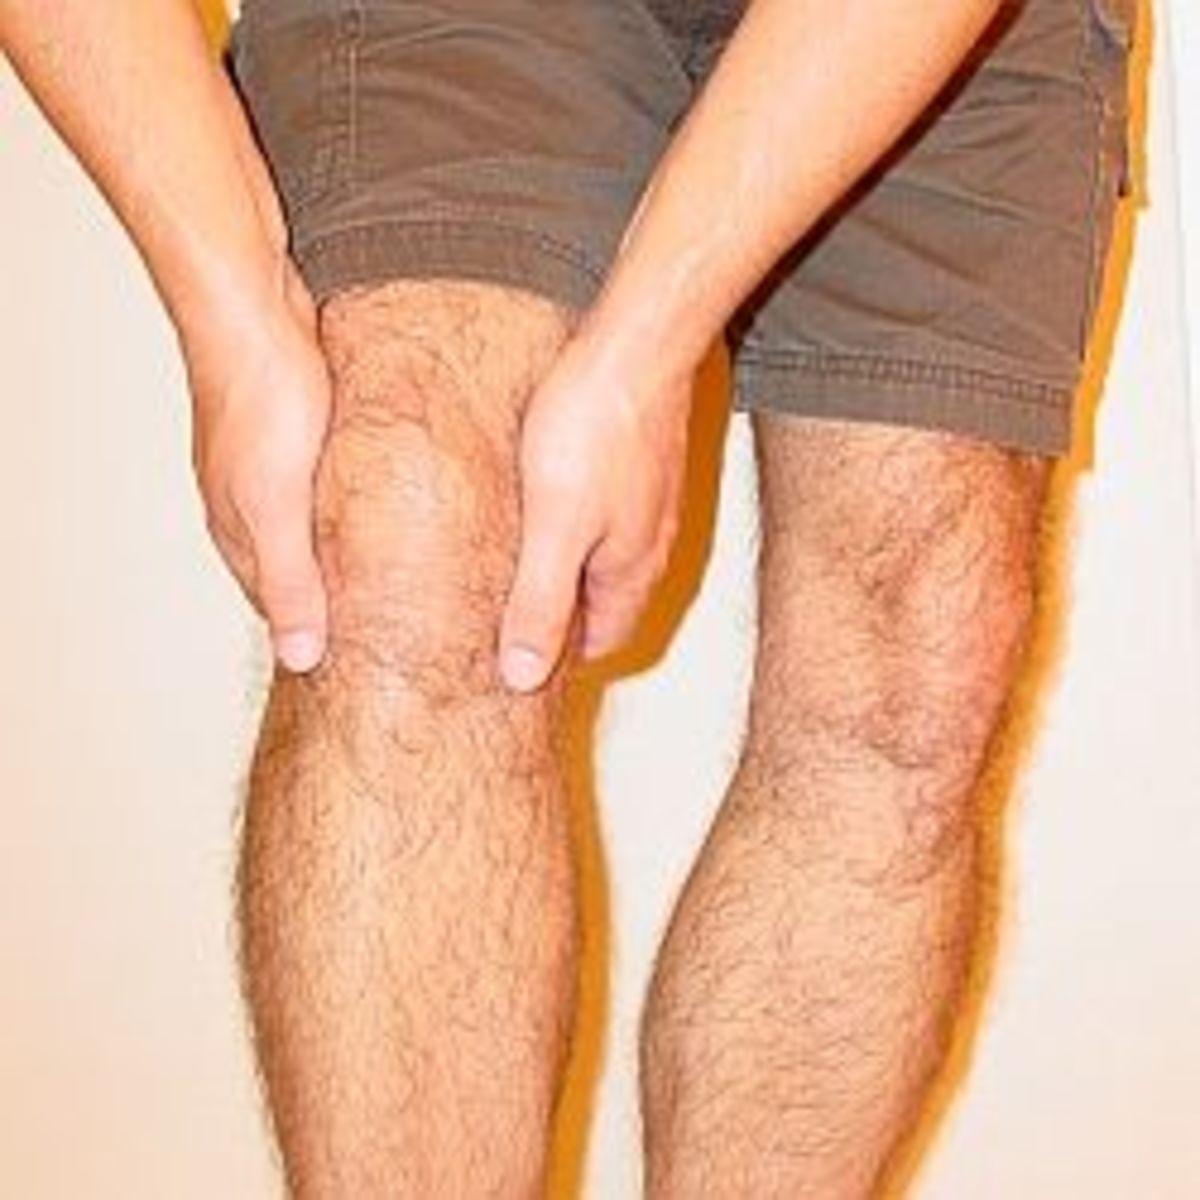 My Knee (Photo Credit Dorian)